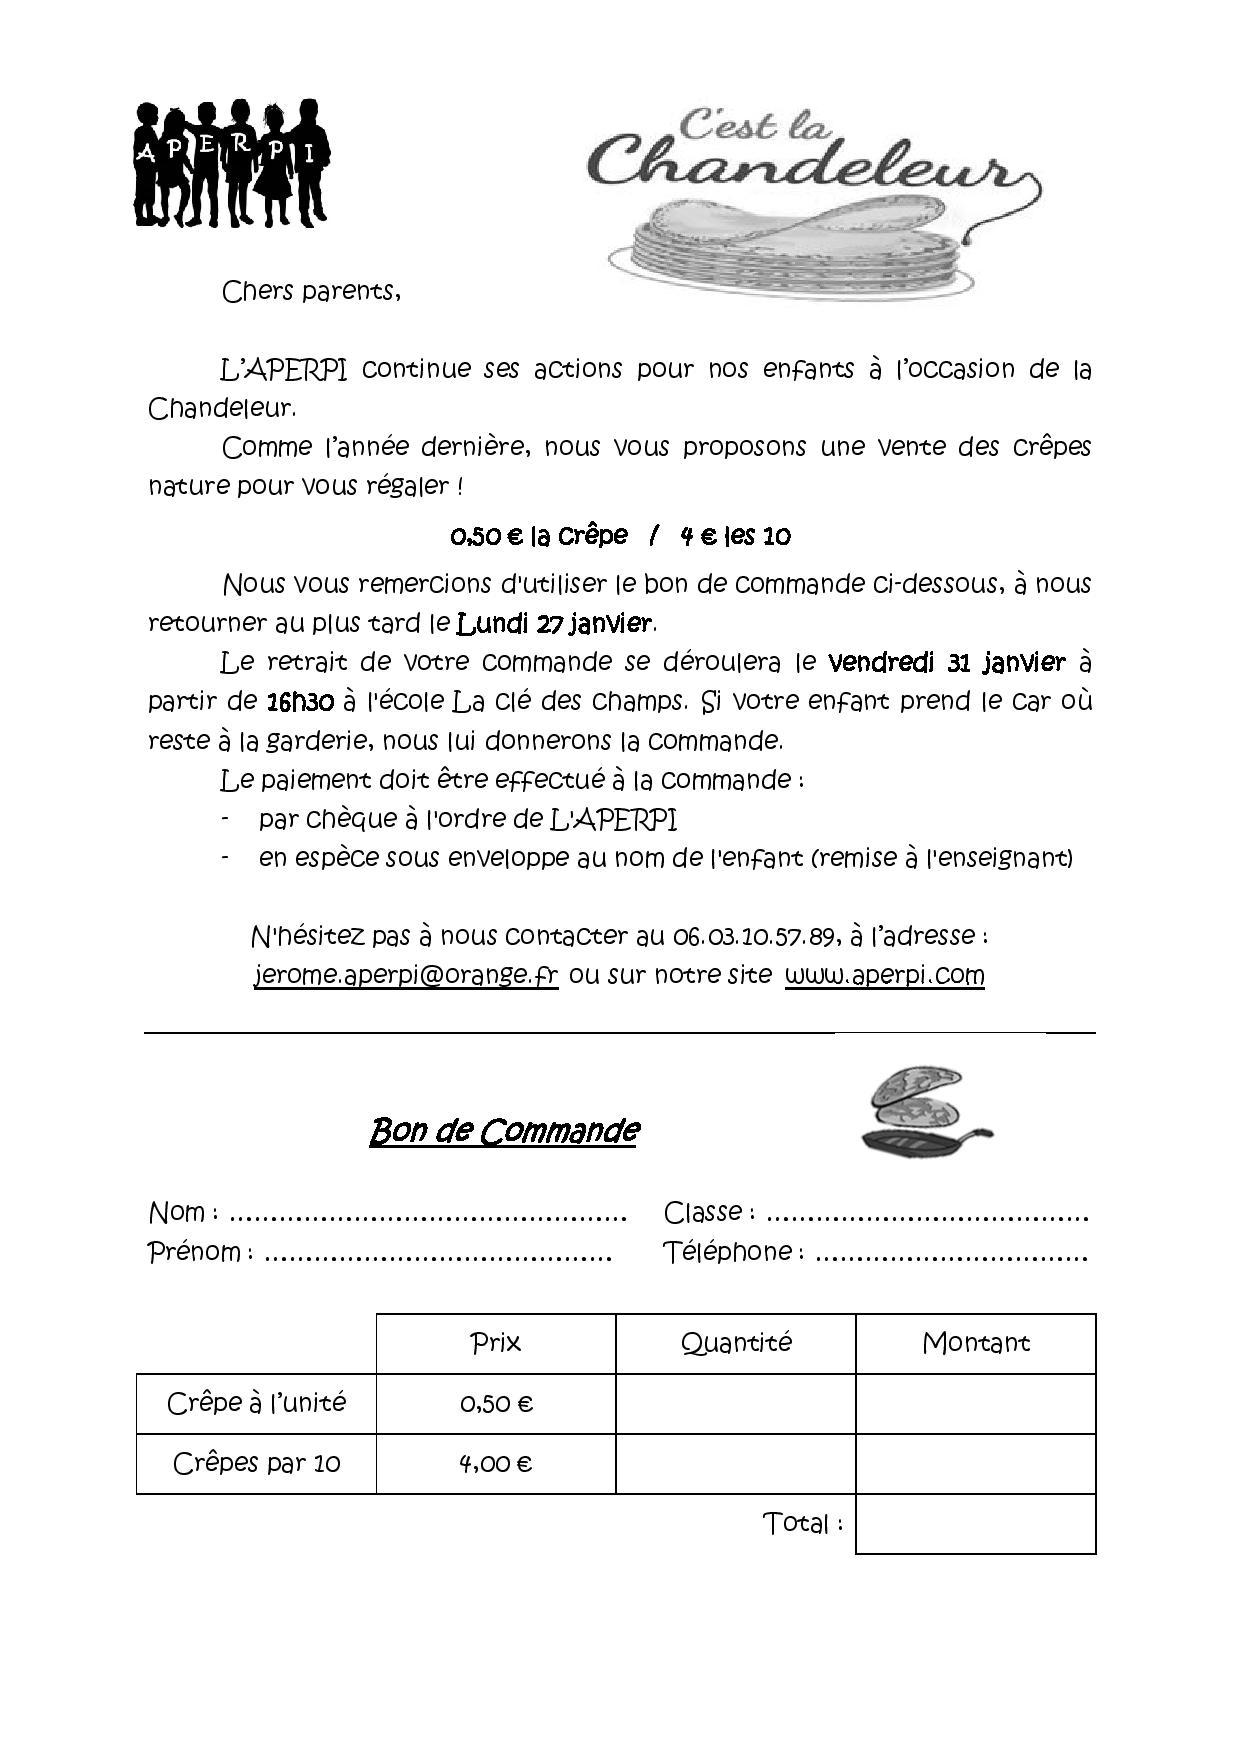 Mot cahiers Crêpes-page-001